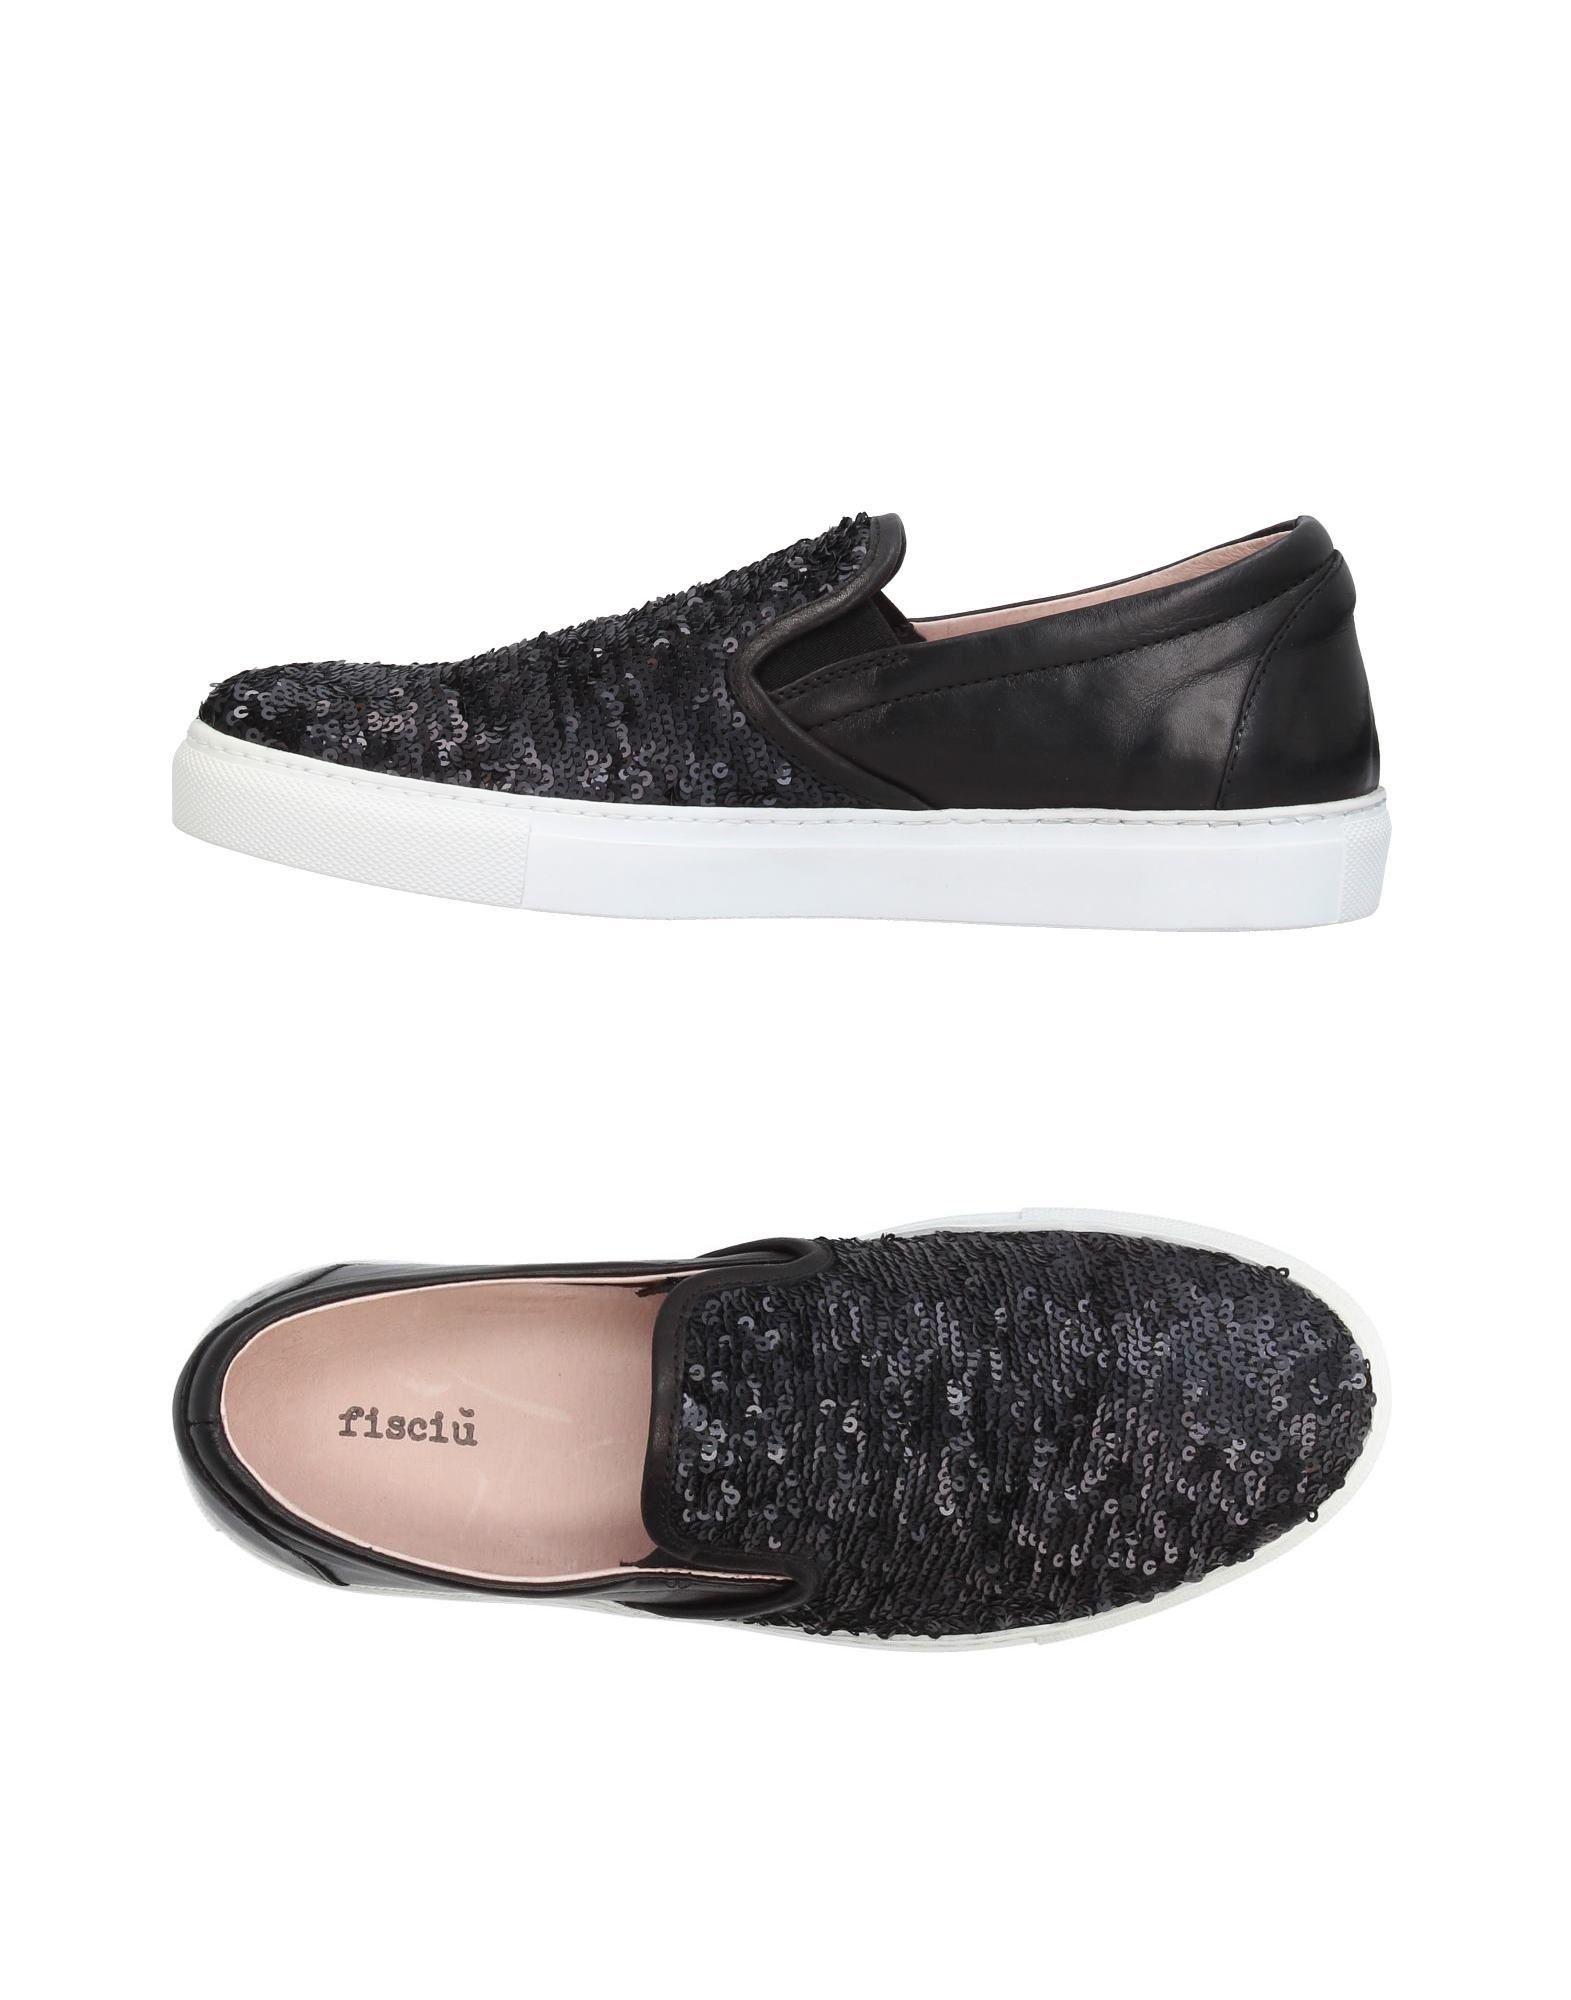 Sneakers Fisciù Femme - Sneakers Fisciù sur